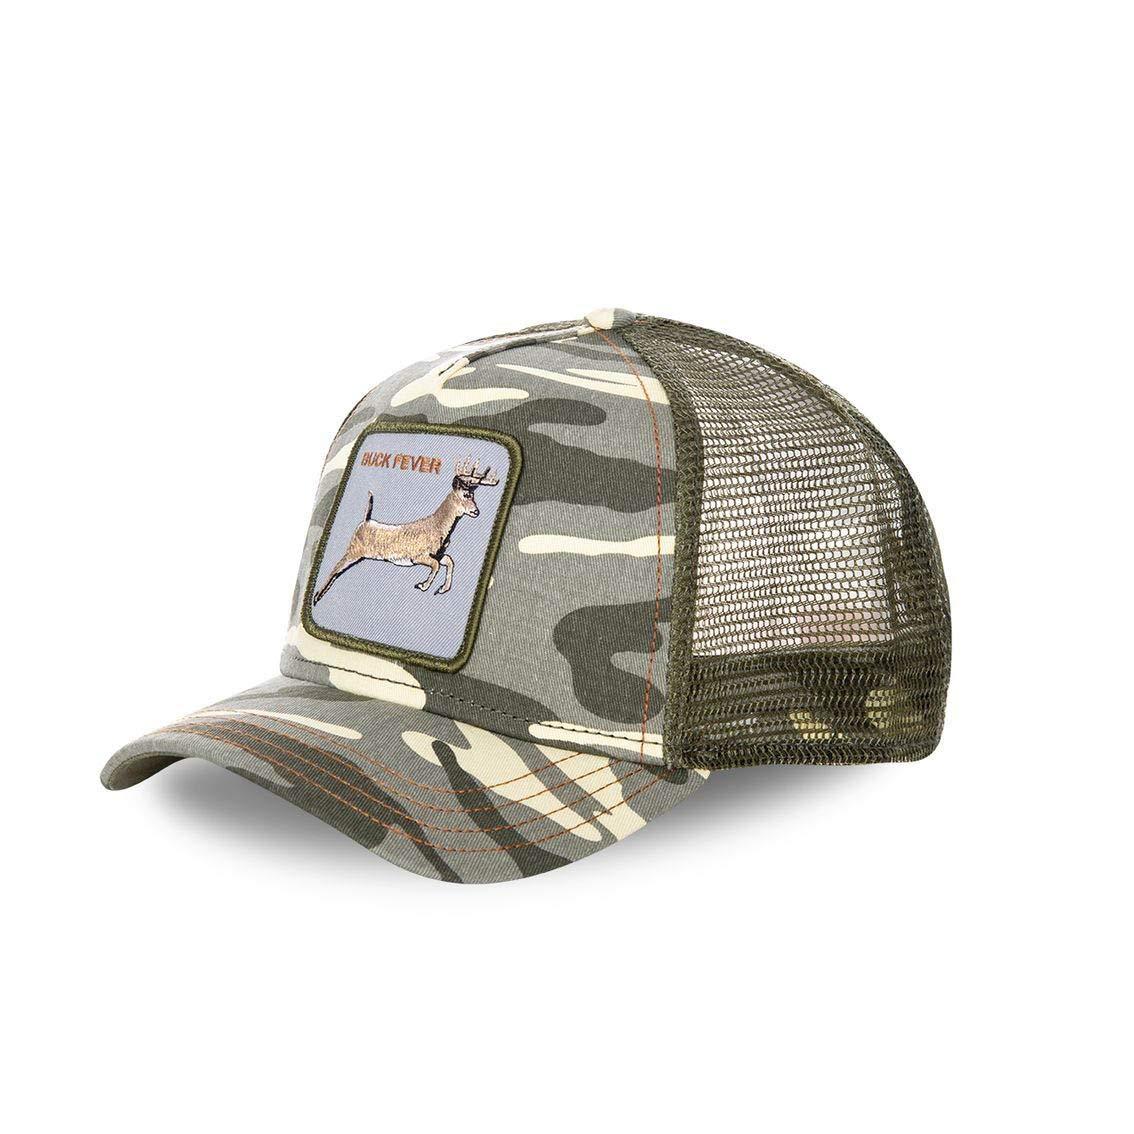 Goorin Bros Casquette Baseball Buck Fever Camouflage